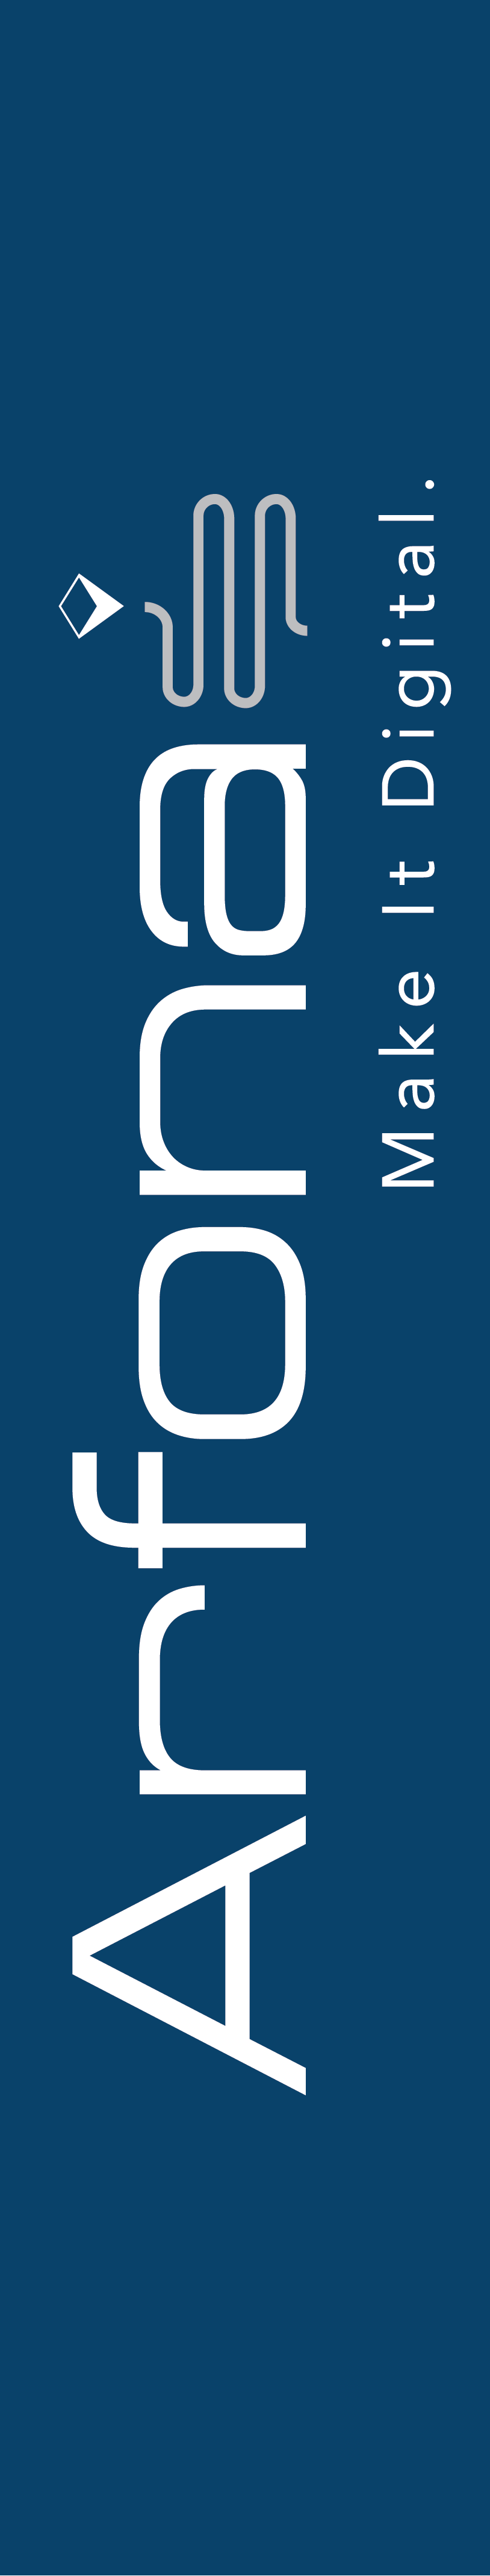 Arfona Logo White on Blue BG-01.png